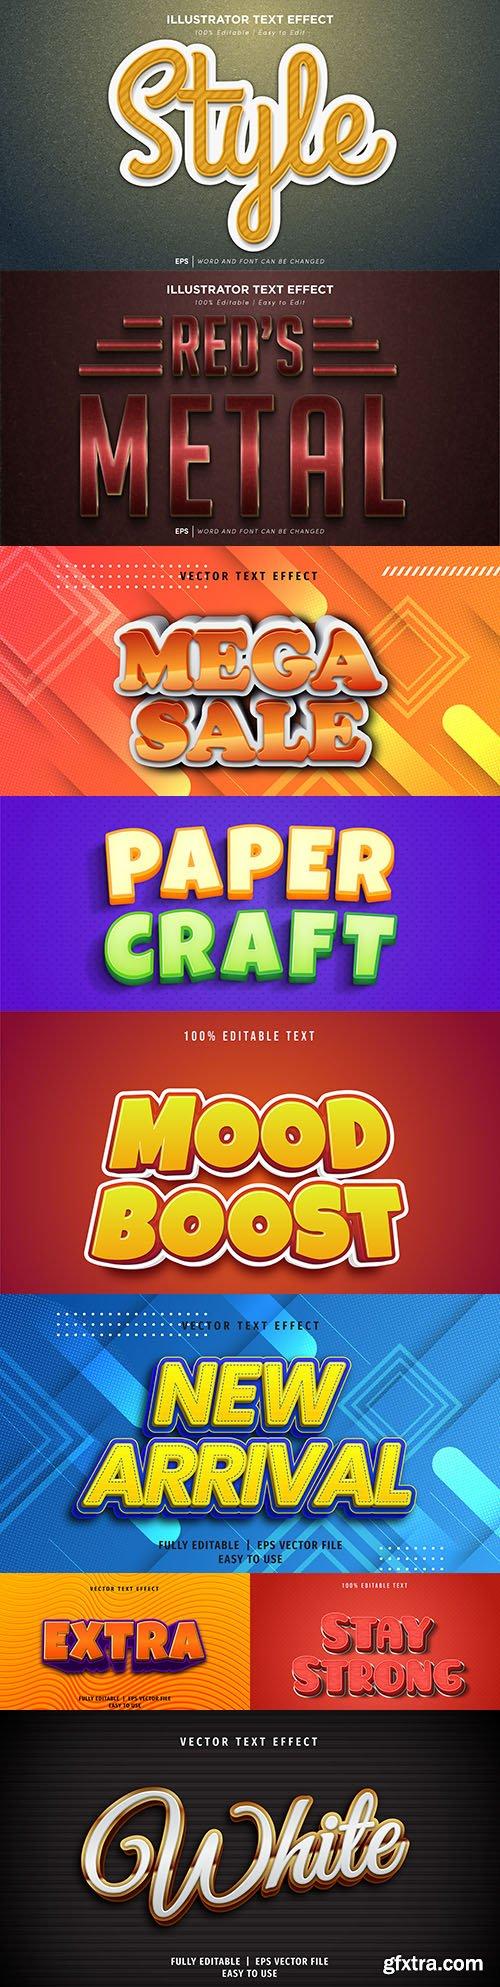 Editable font effect text collection illustration design 193